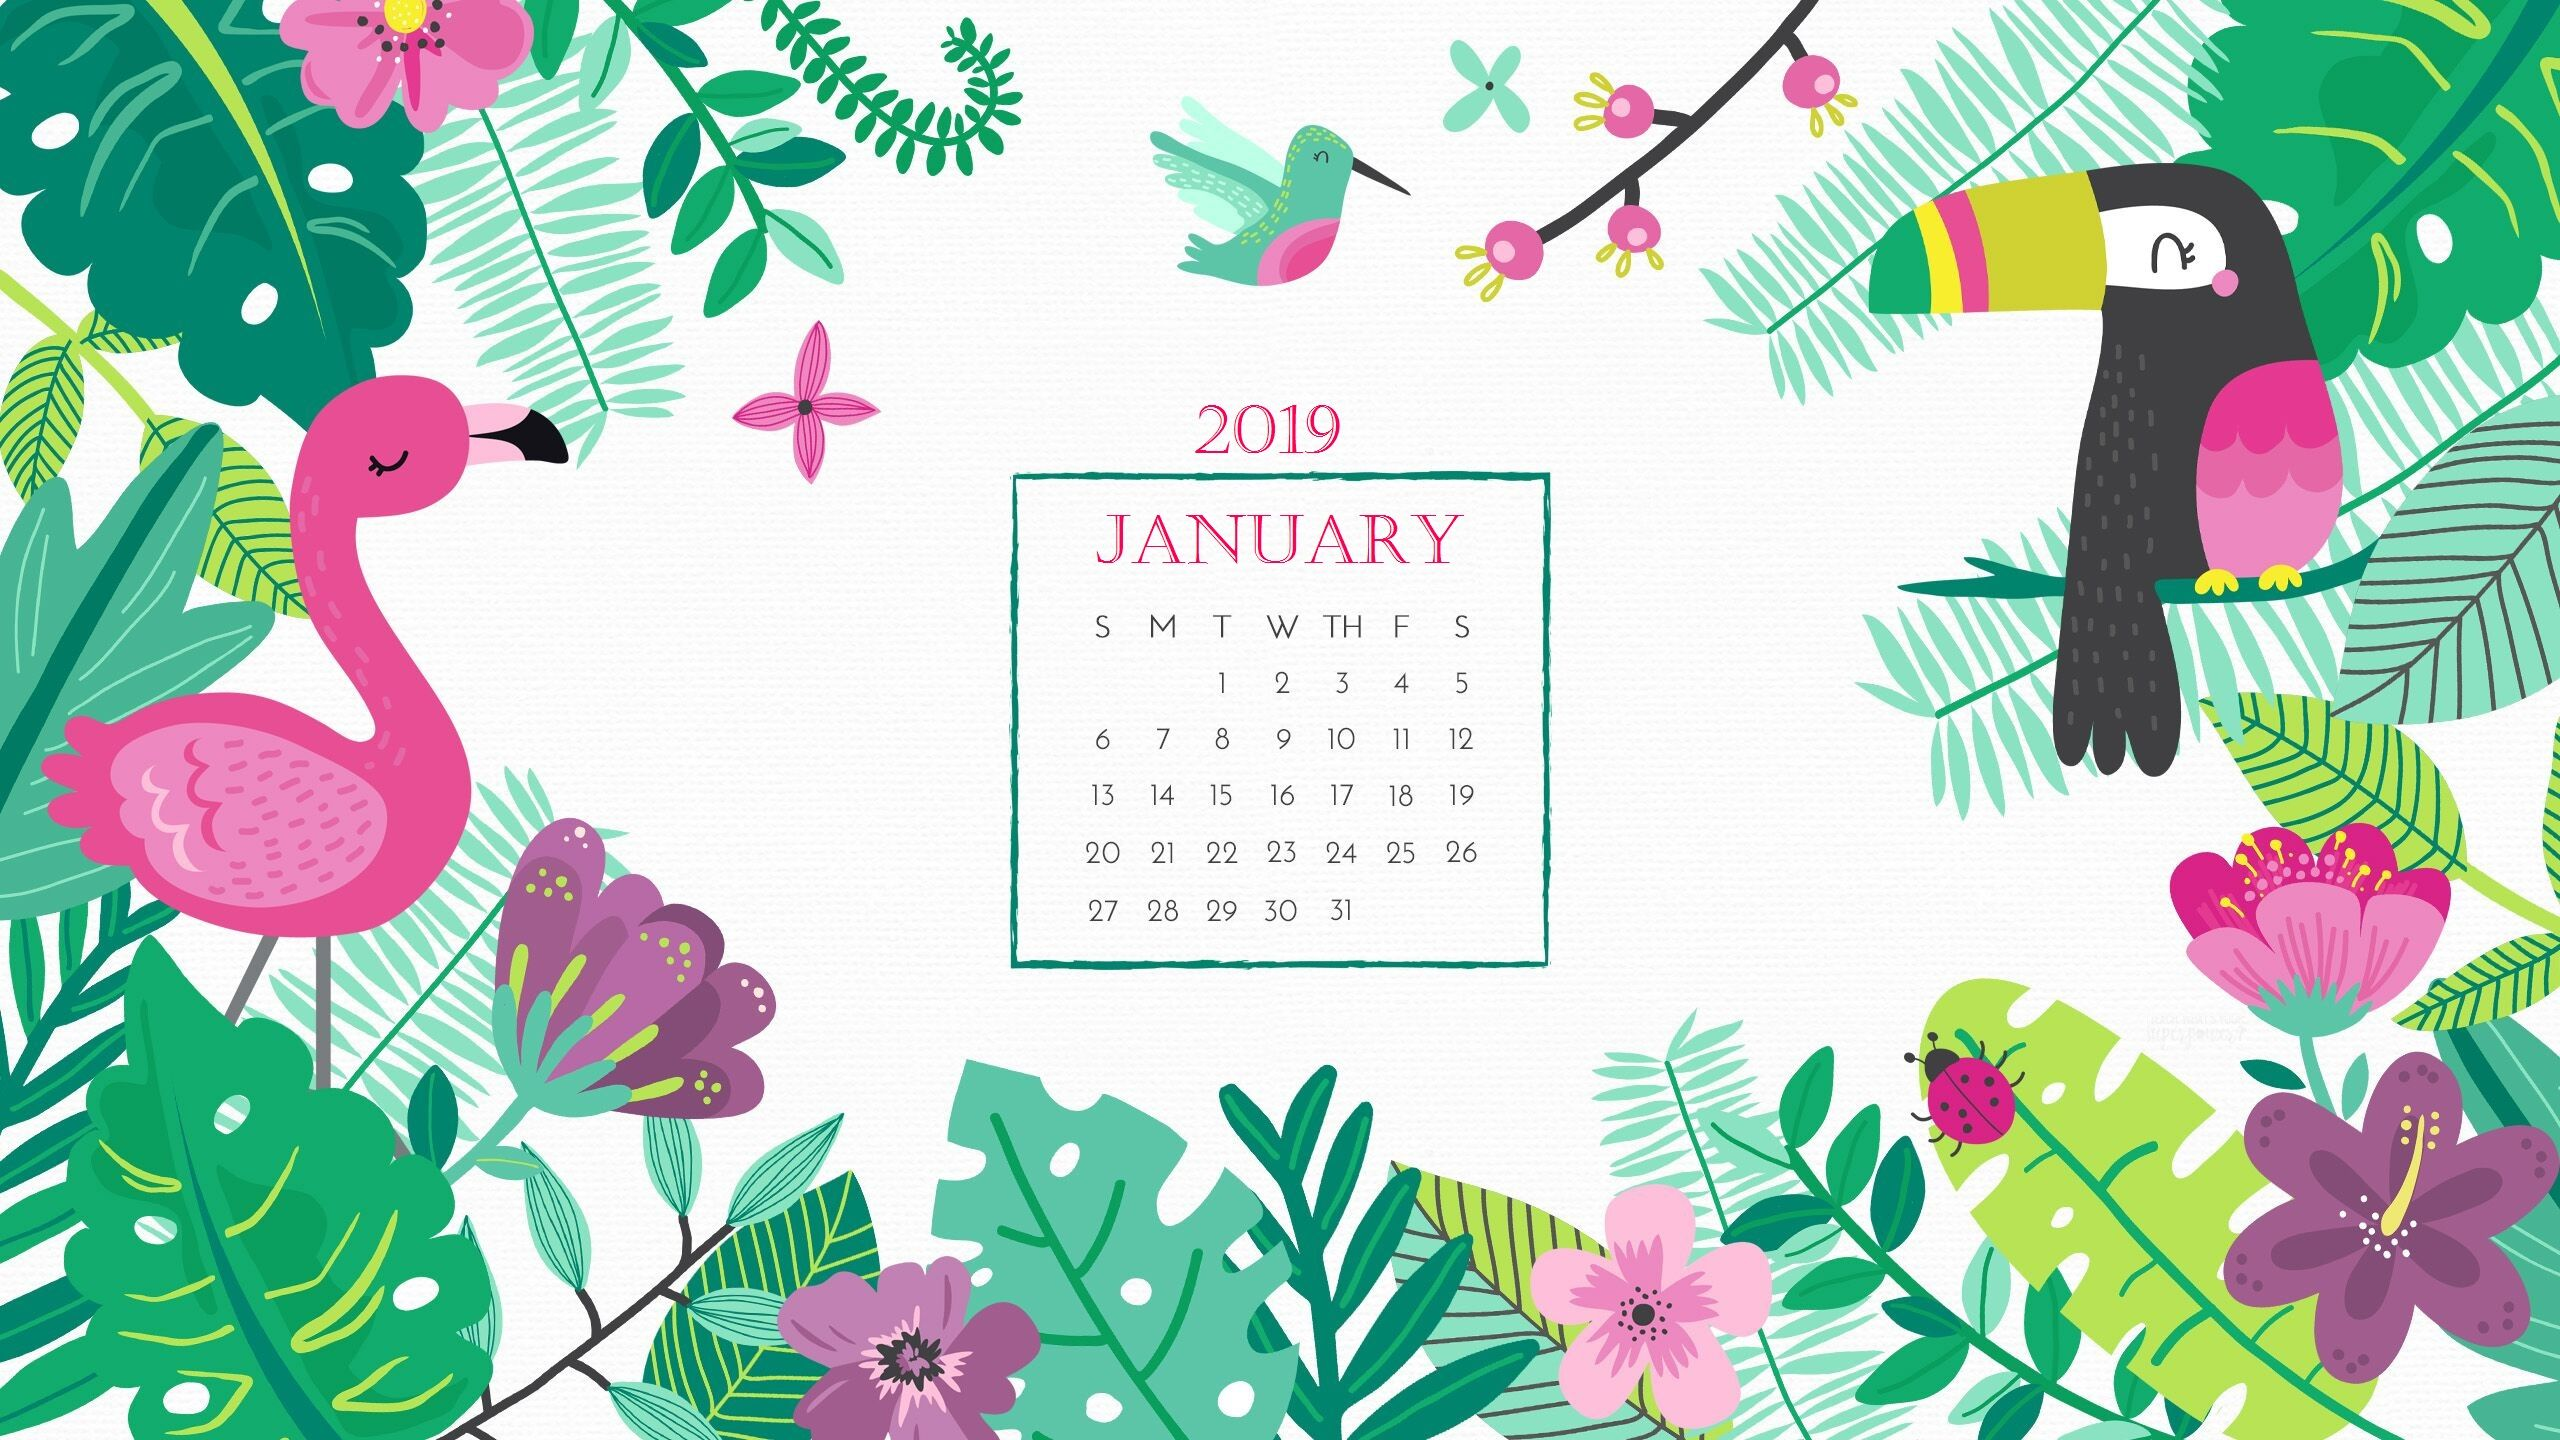 January 2019 Wallpaper With Calendar For Desktop